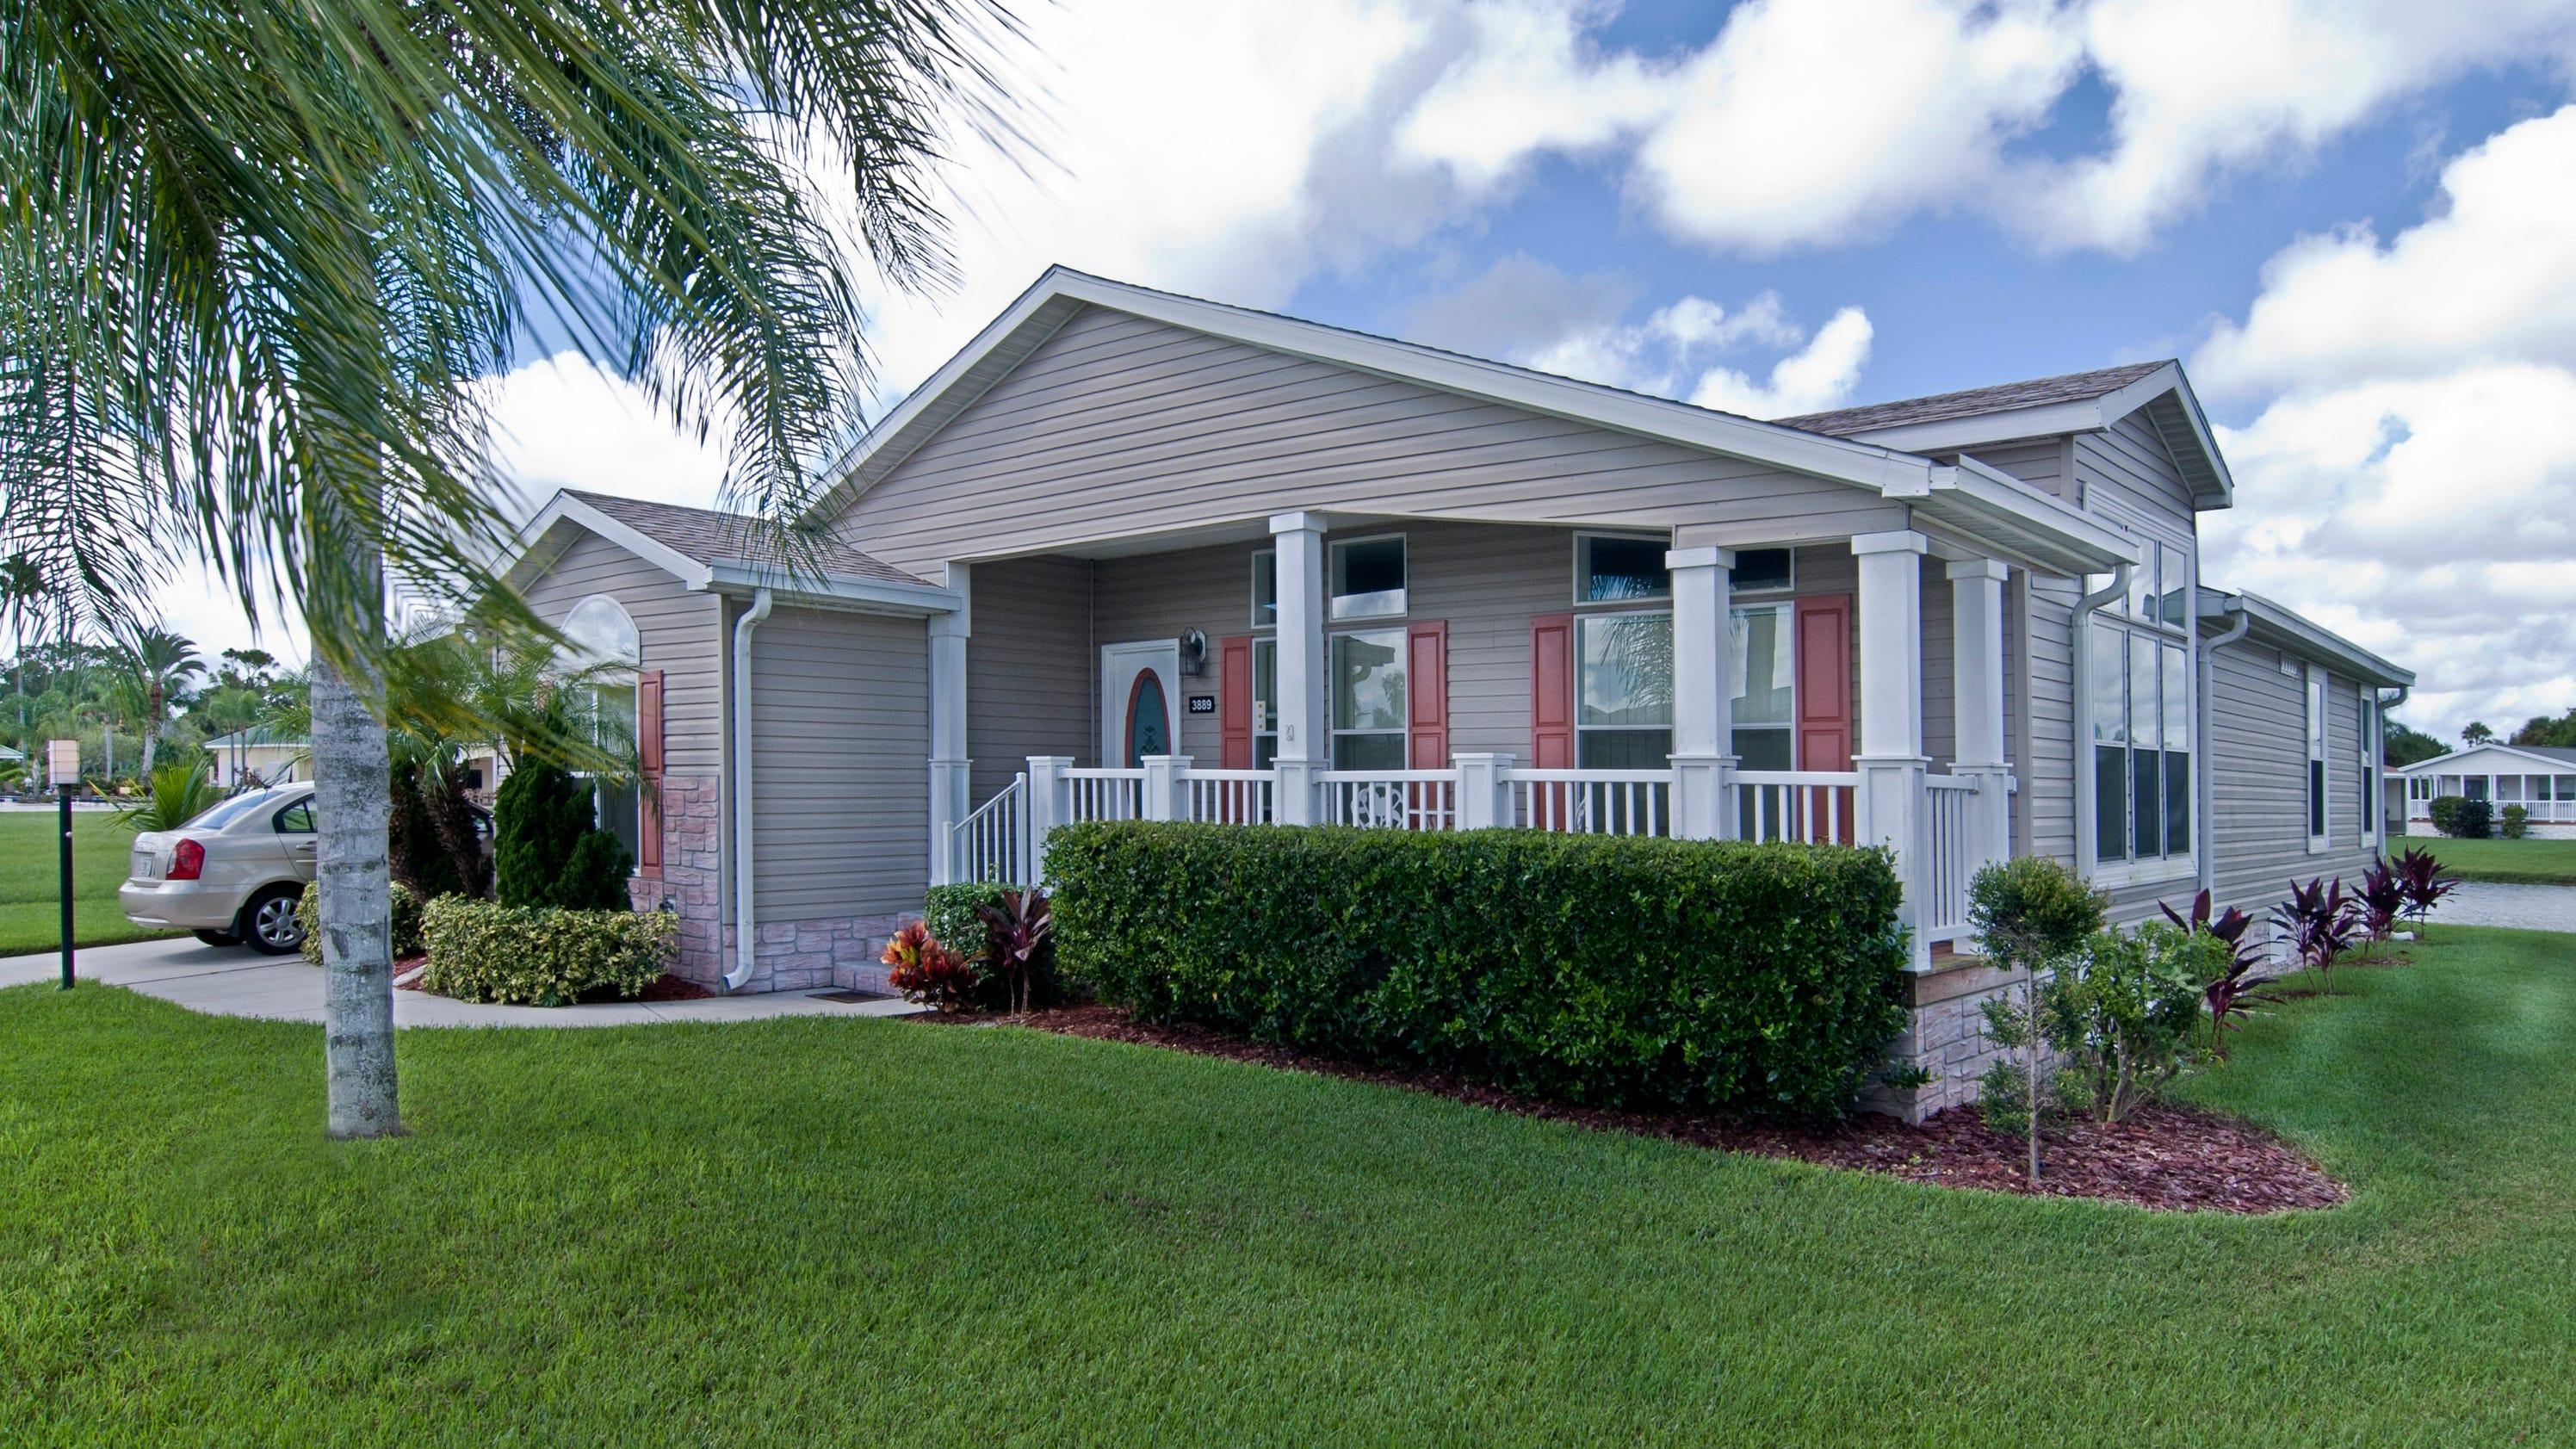 manufactured homes offer open floor plans  custom design